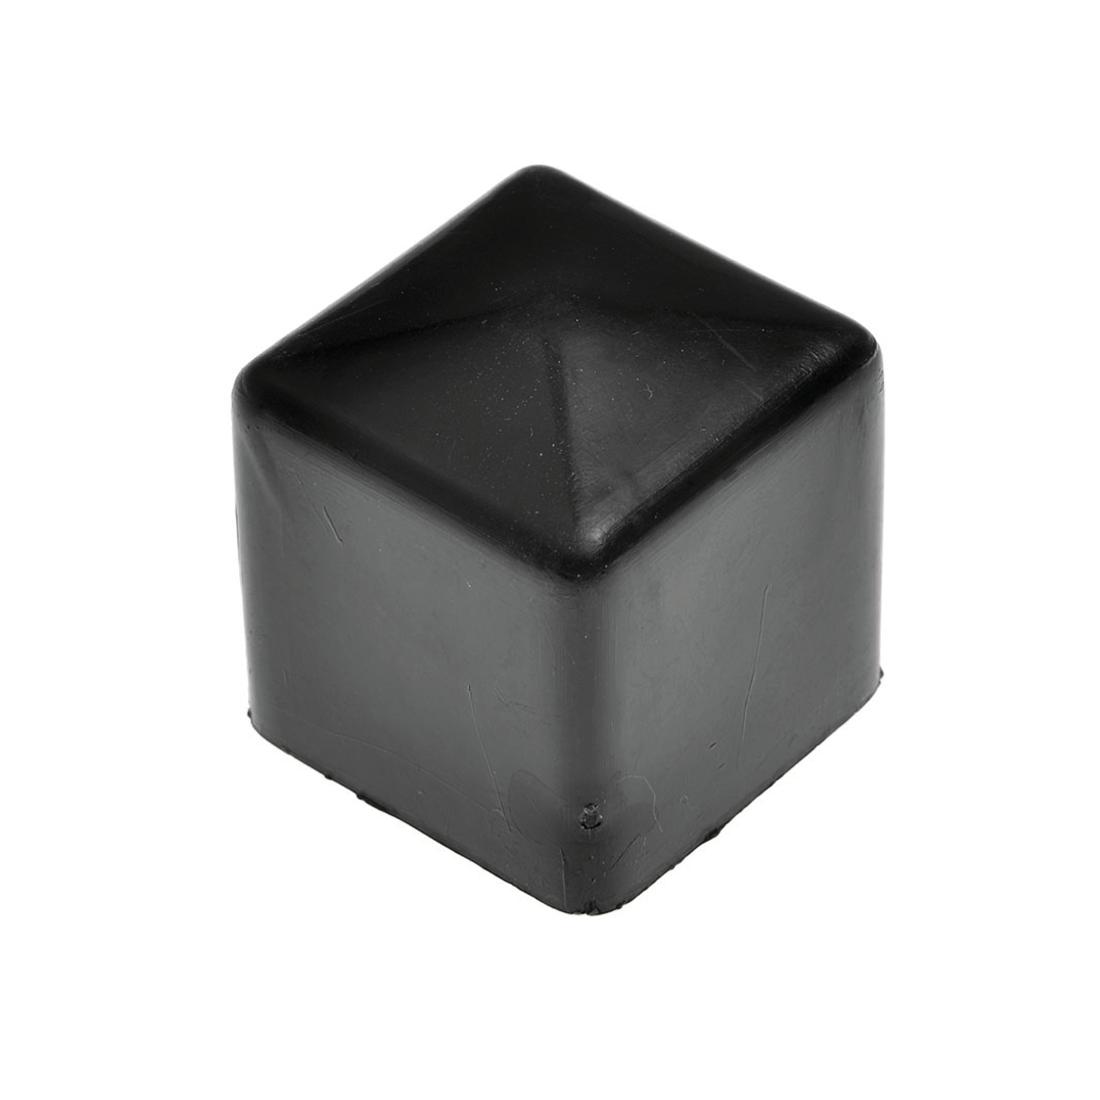 Square Ferrules and Caps